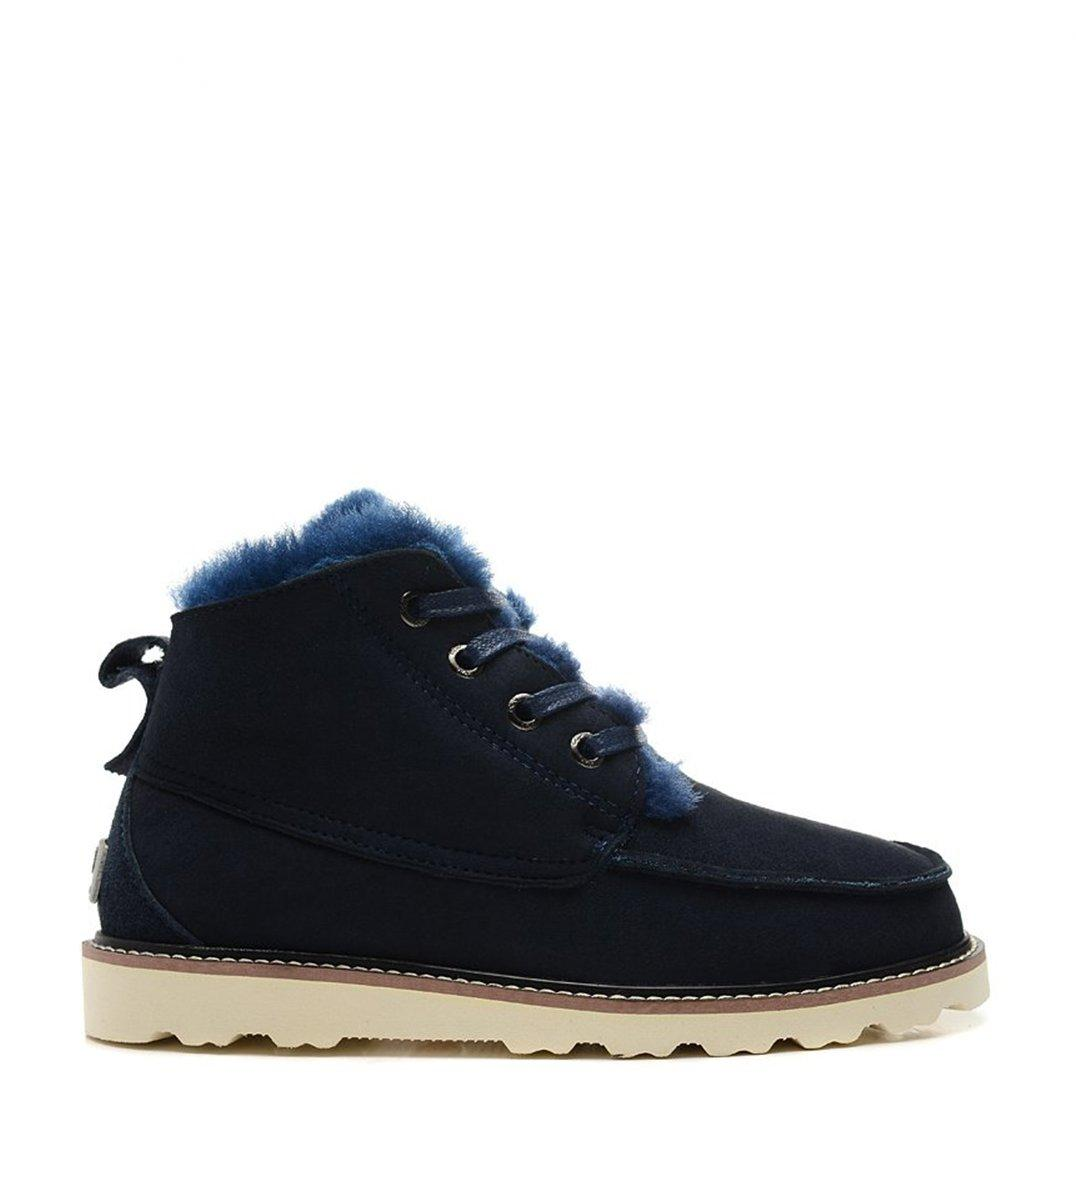 Ботинки мужские UGGs David Beckham Boots Dark Blue - короткие угги, синие, зима-весна